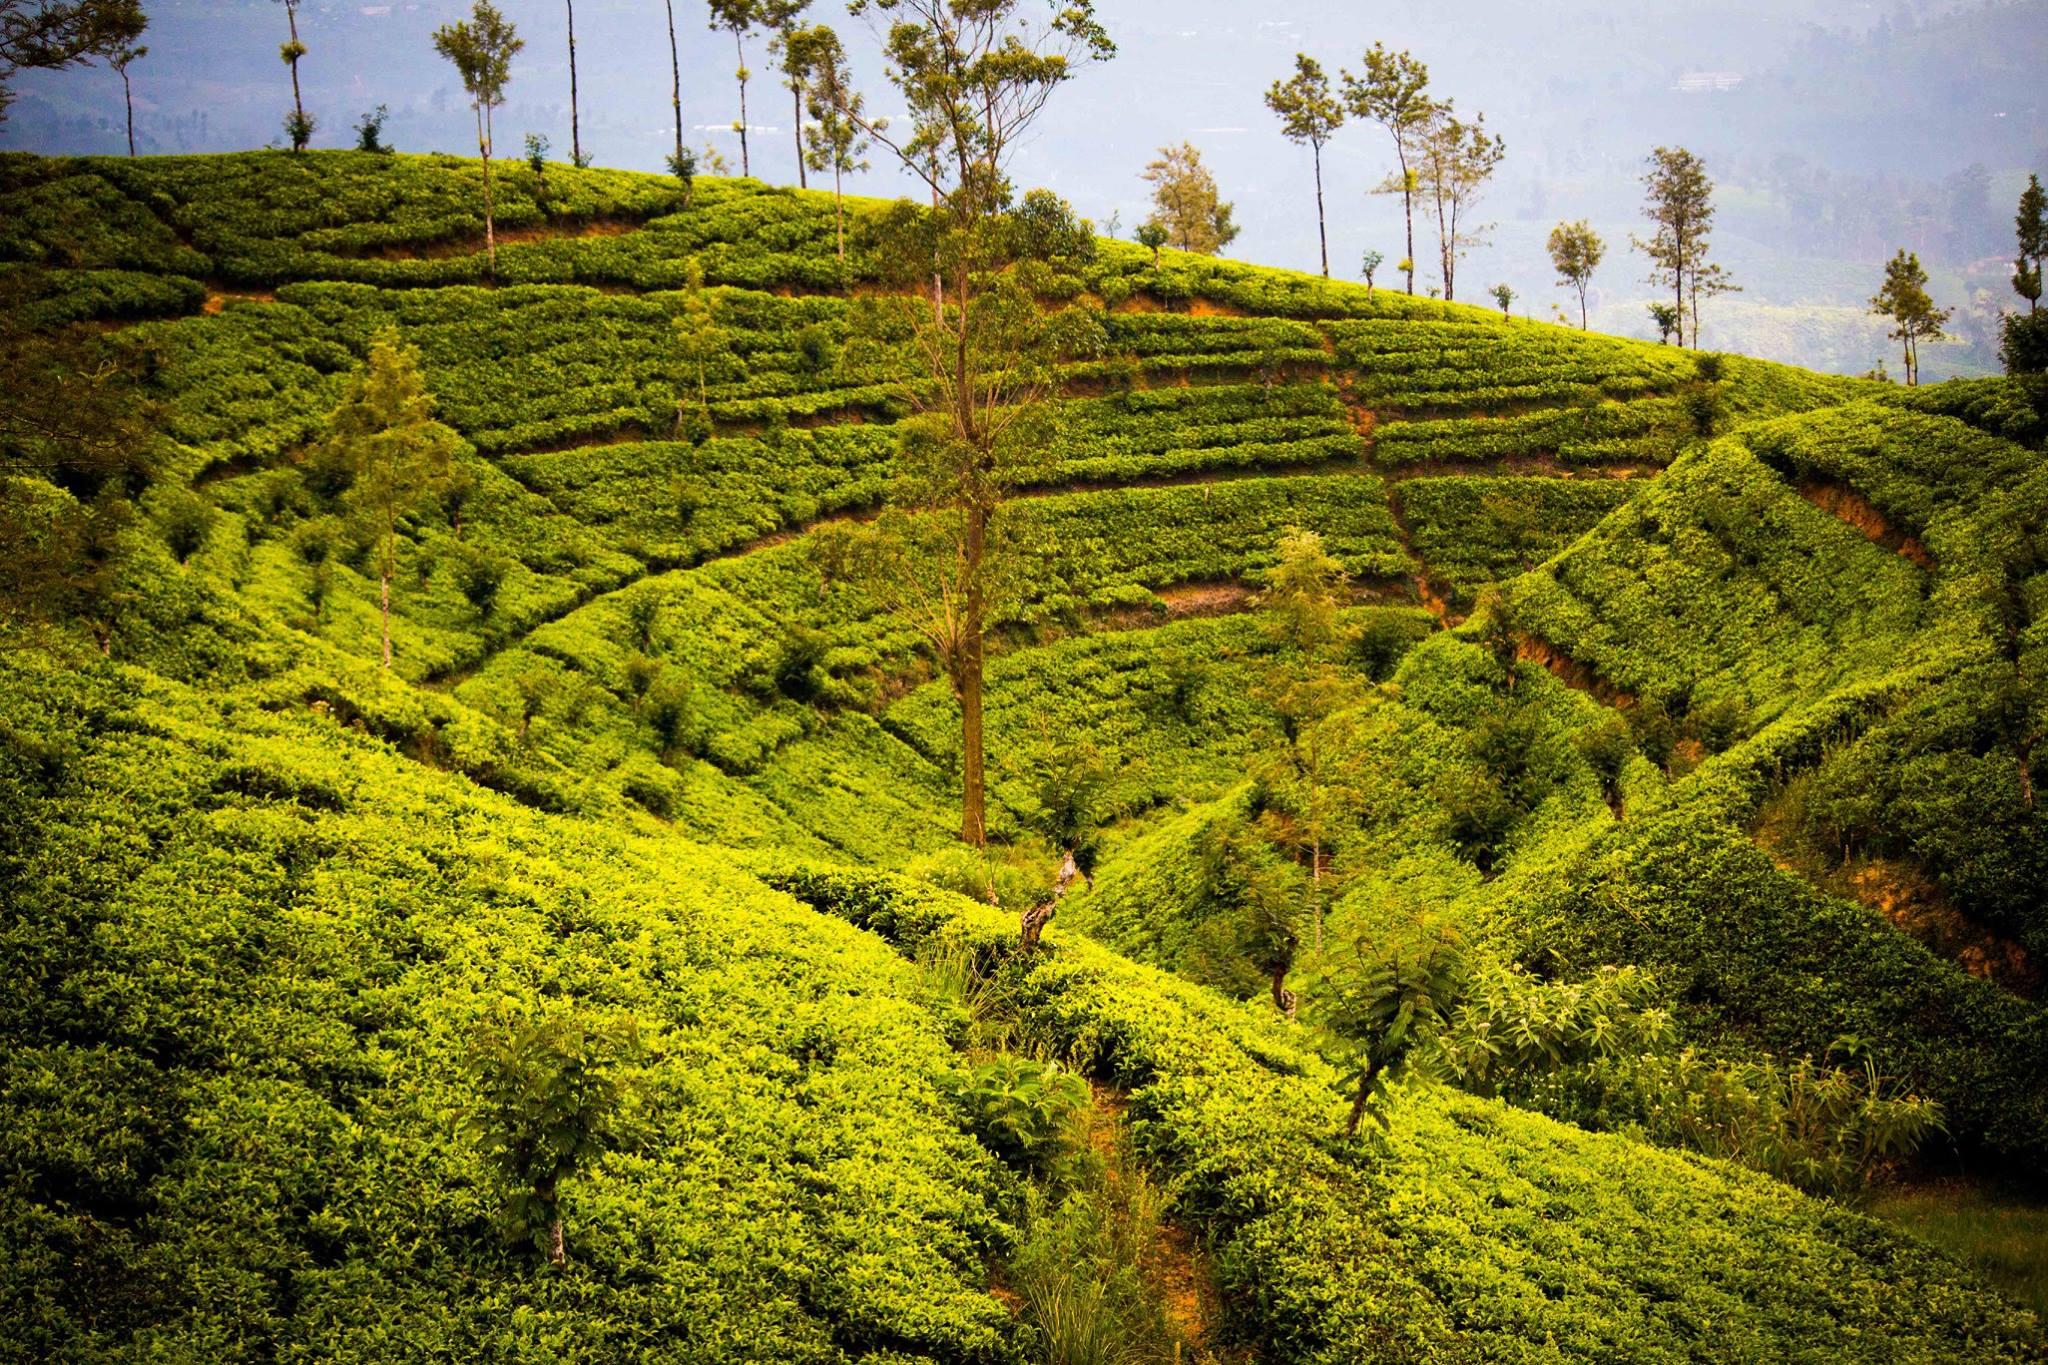 invite-to-paradise-sri-lanka-and-maldives-specialists-travel-agent-tour-operator-customer-review--feedback-joel-rhian-tea-plantation-2.jpg